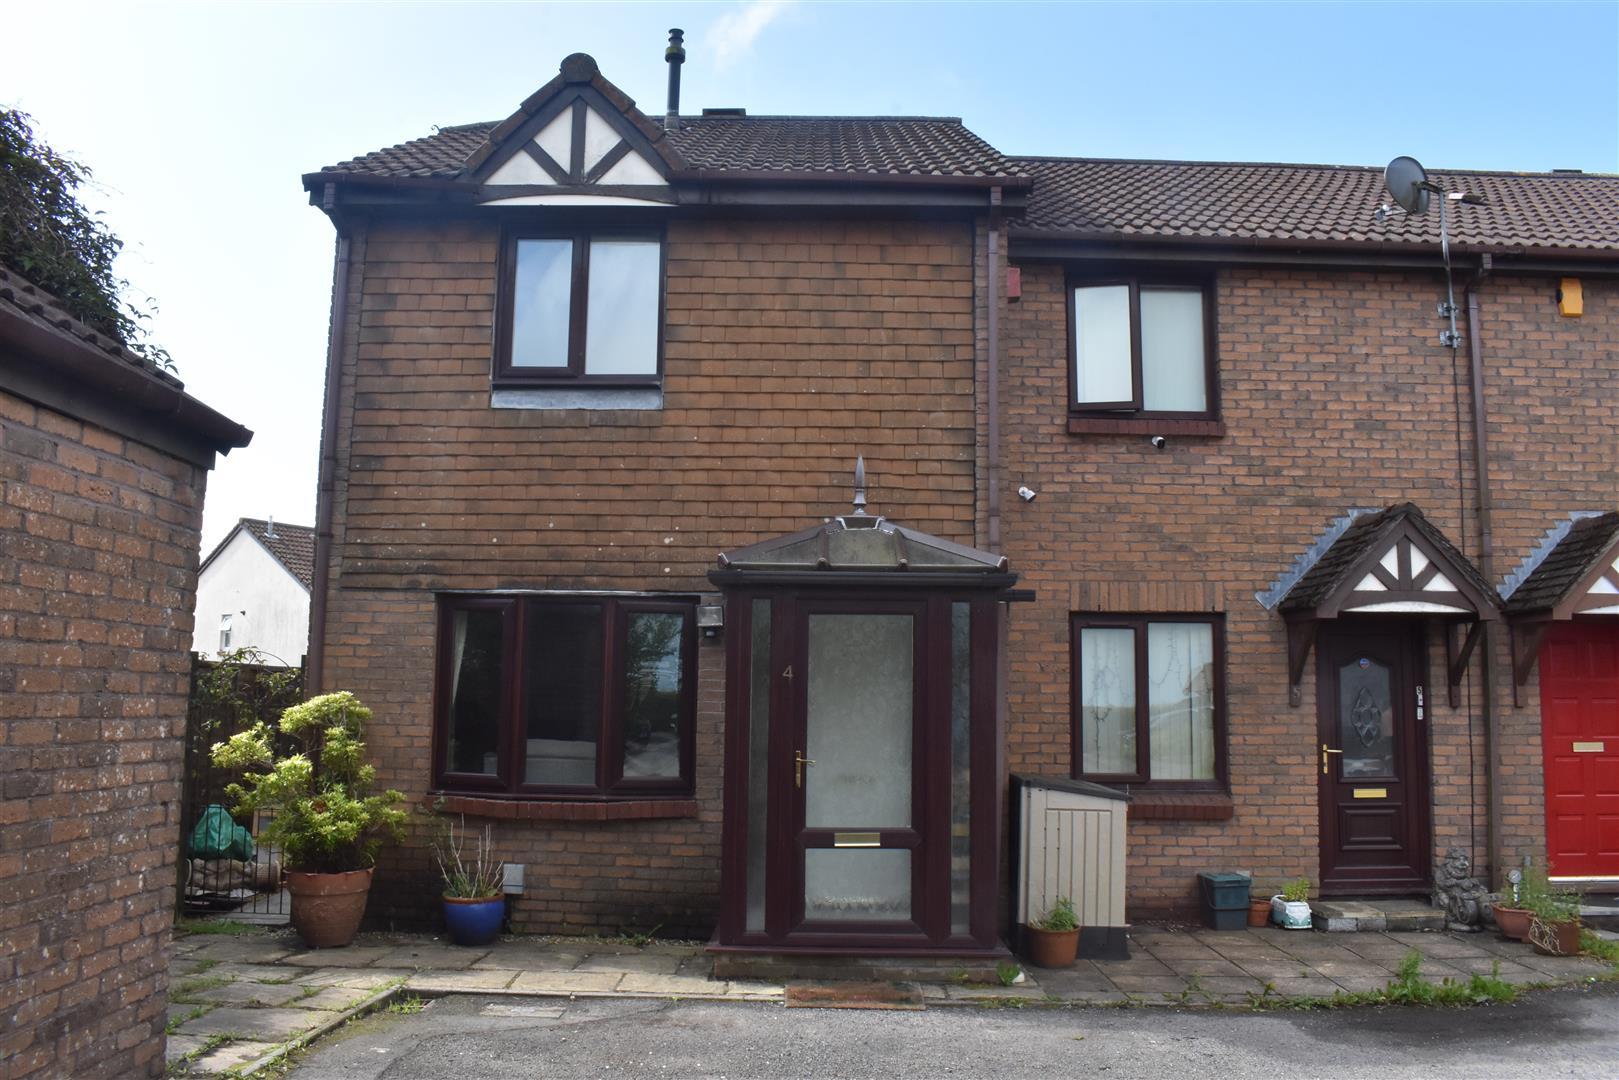 Rosemary Close, Sketty, Swansea, SA2 9HZ